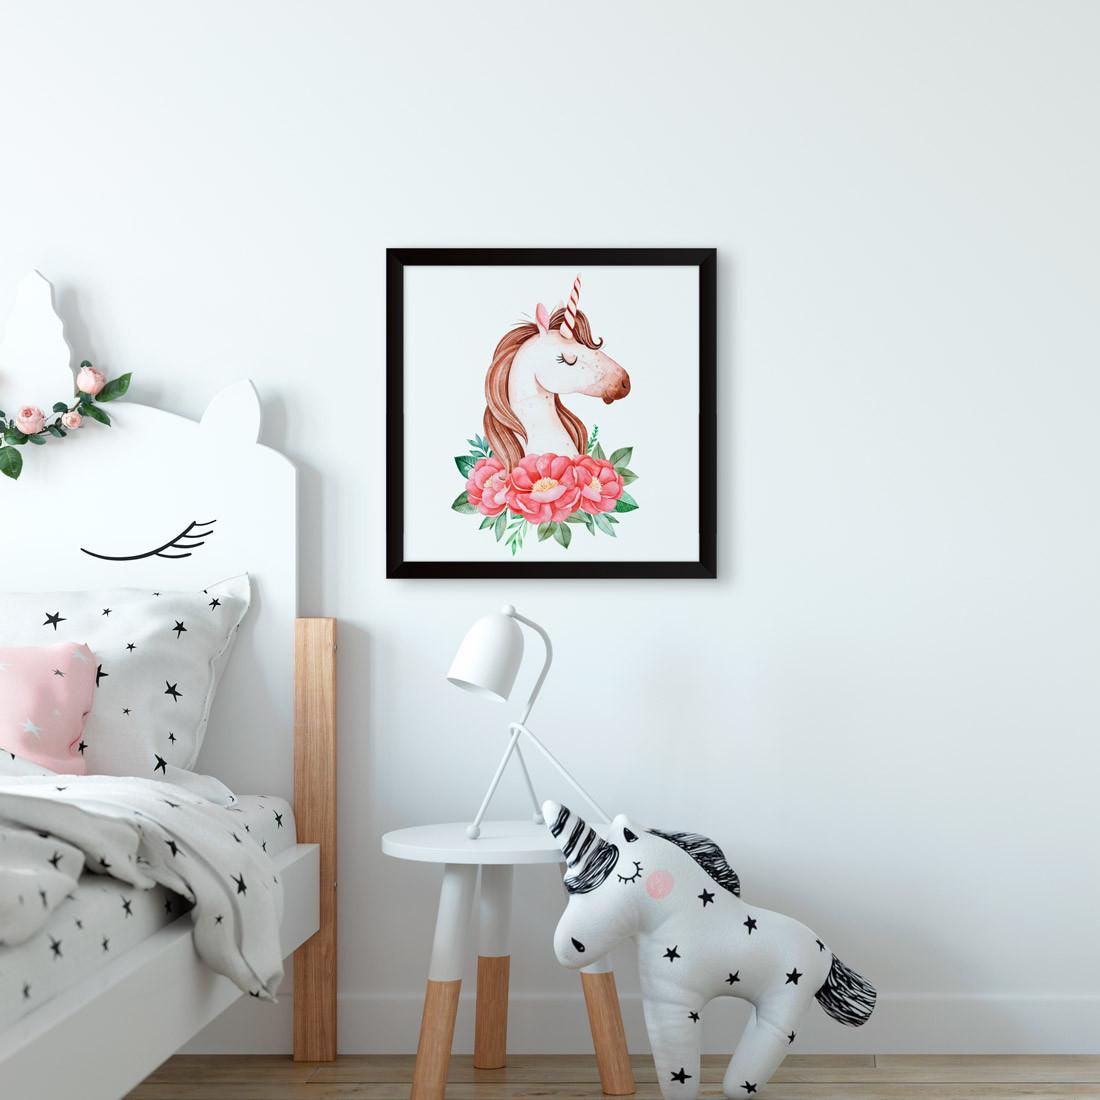 Quadrinho Decorativo Unicórnio Infantil